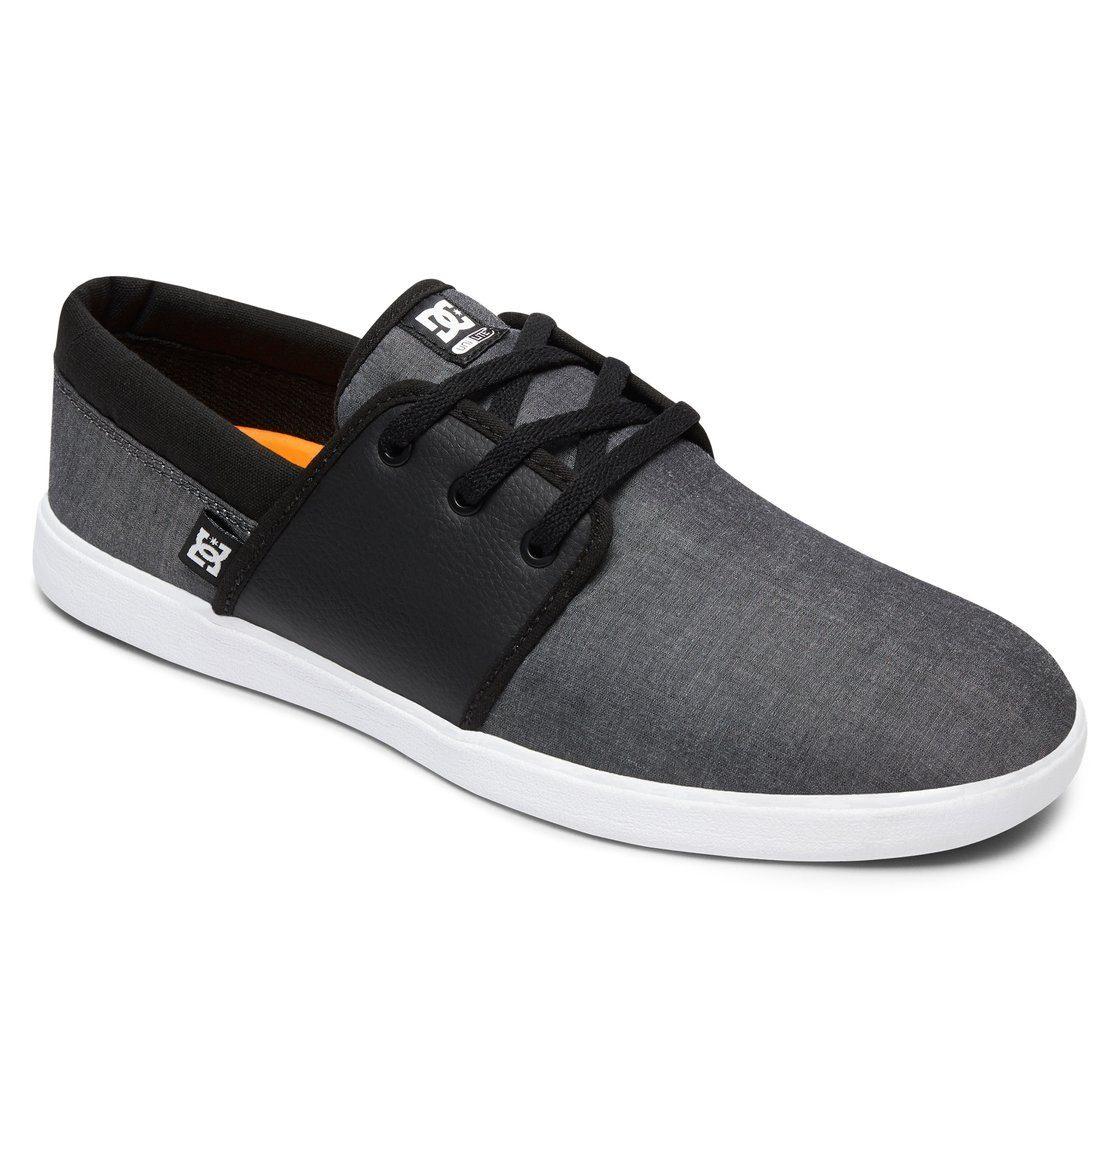 DC Shoes Schuhe Haven TX SE online kaufen  Black#ft5_slash#black#ft5_slash#grey